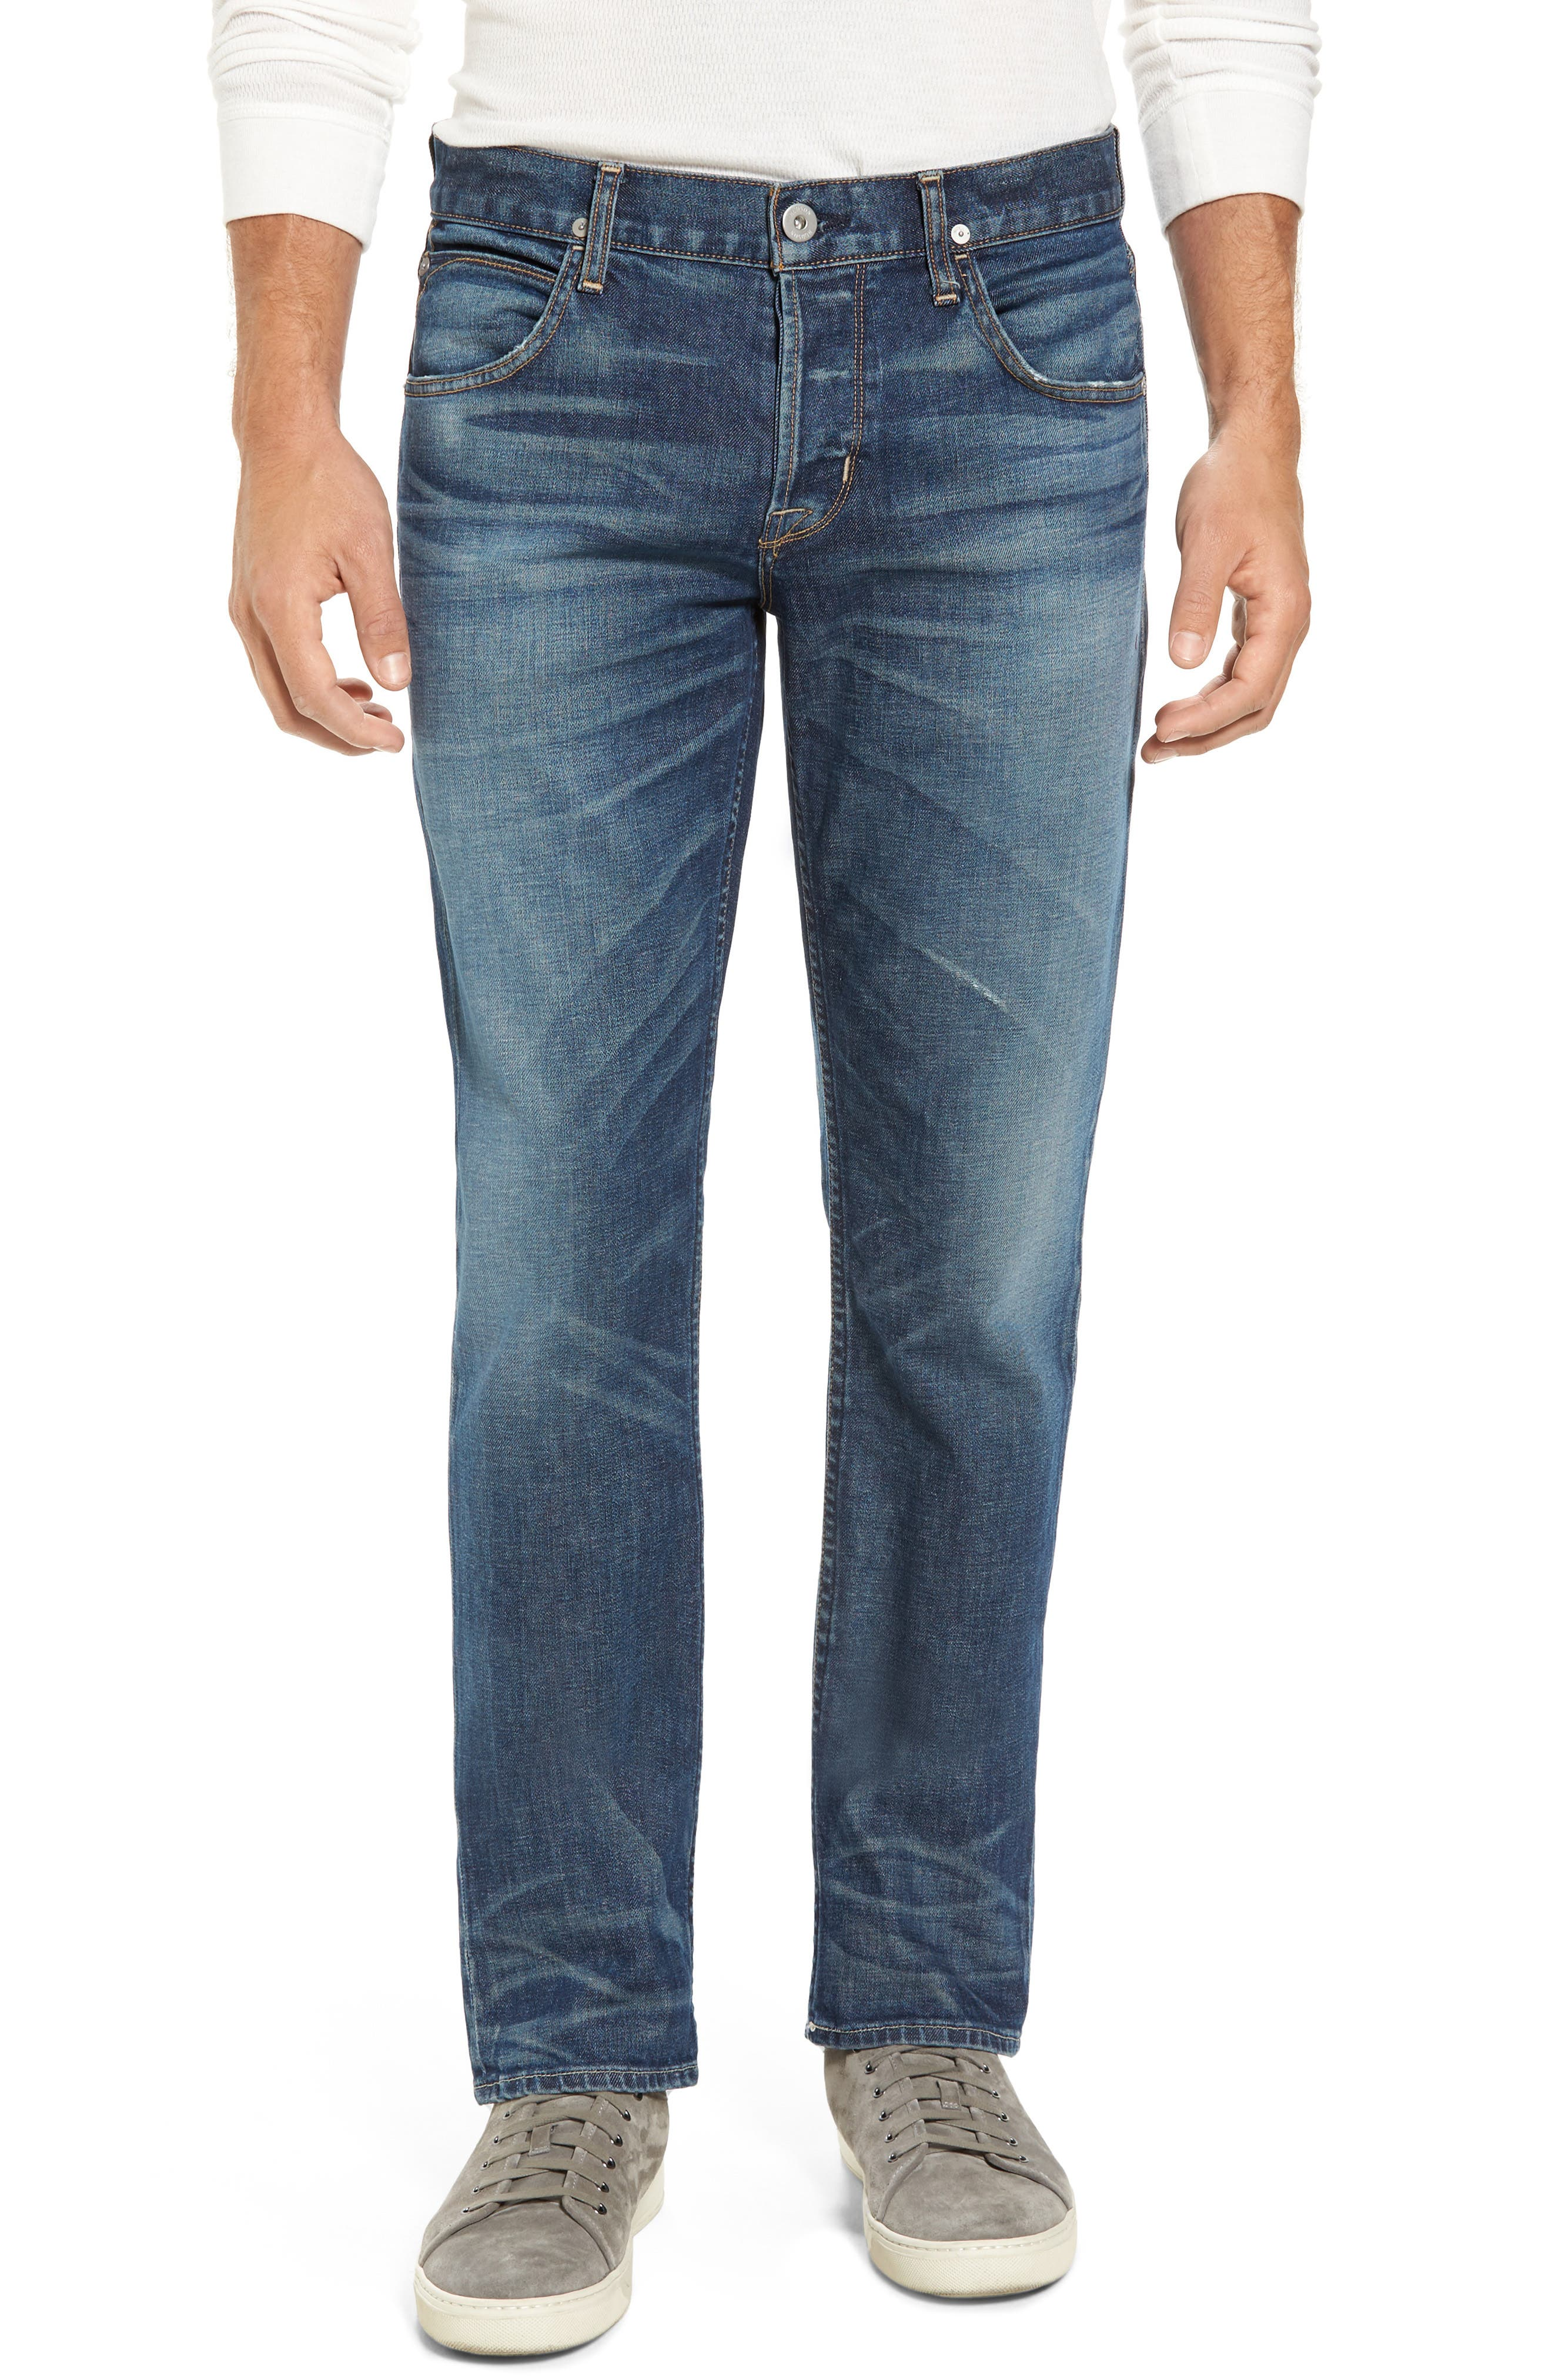 Blake Slim Fit Jeans,                         Main,                         color, Scribe